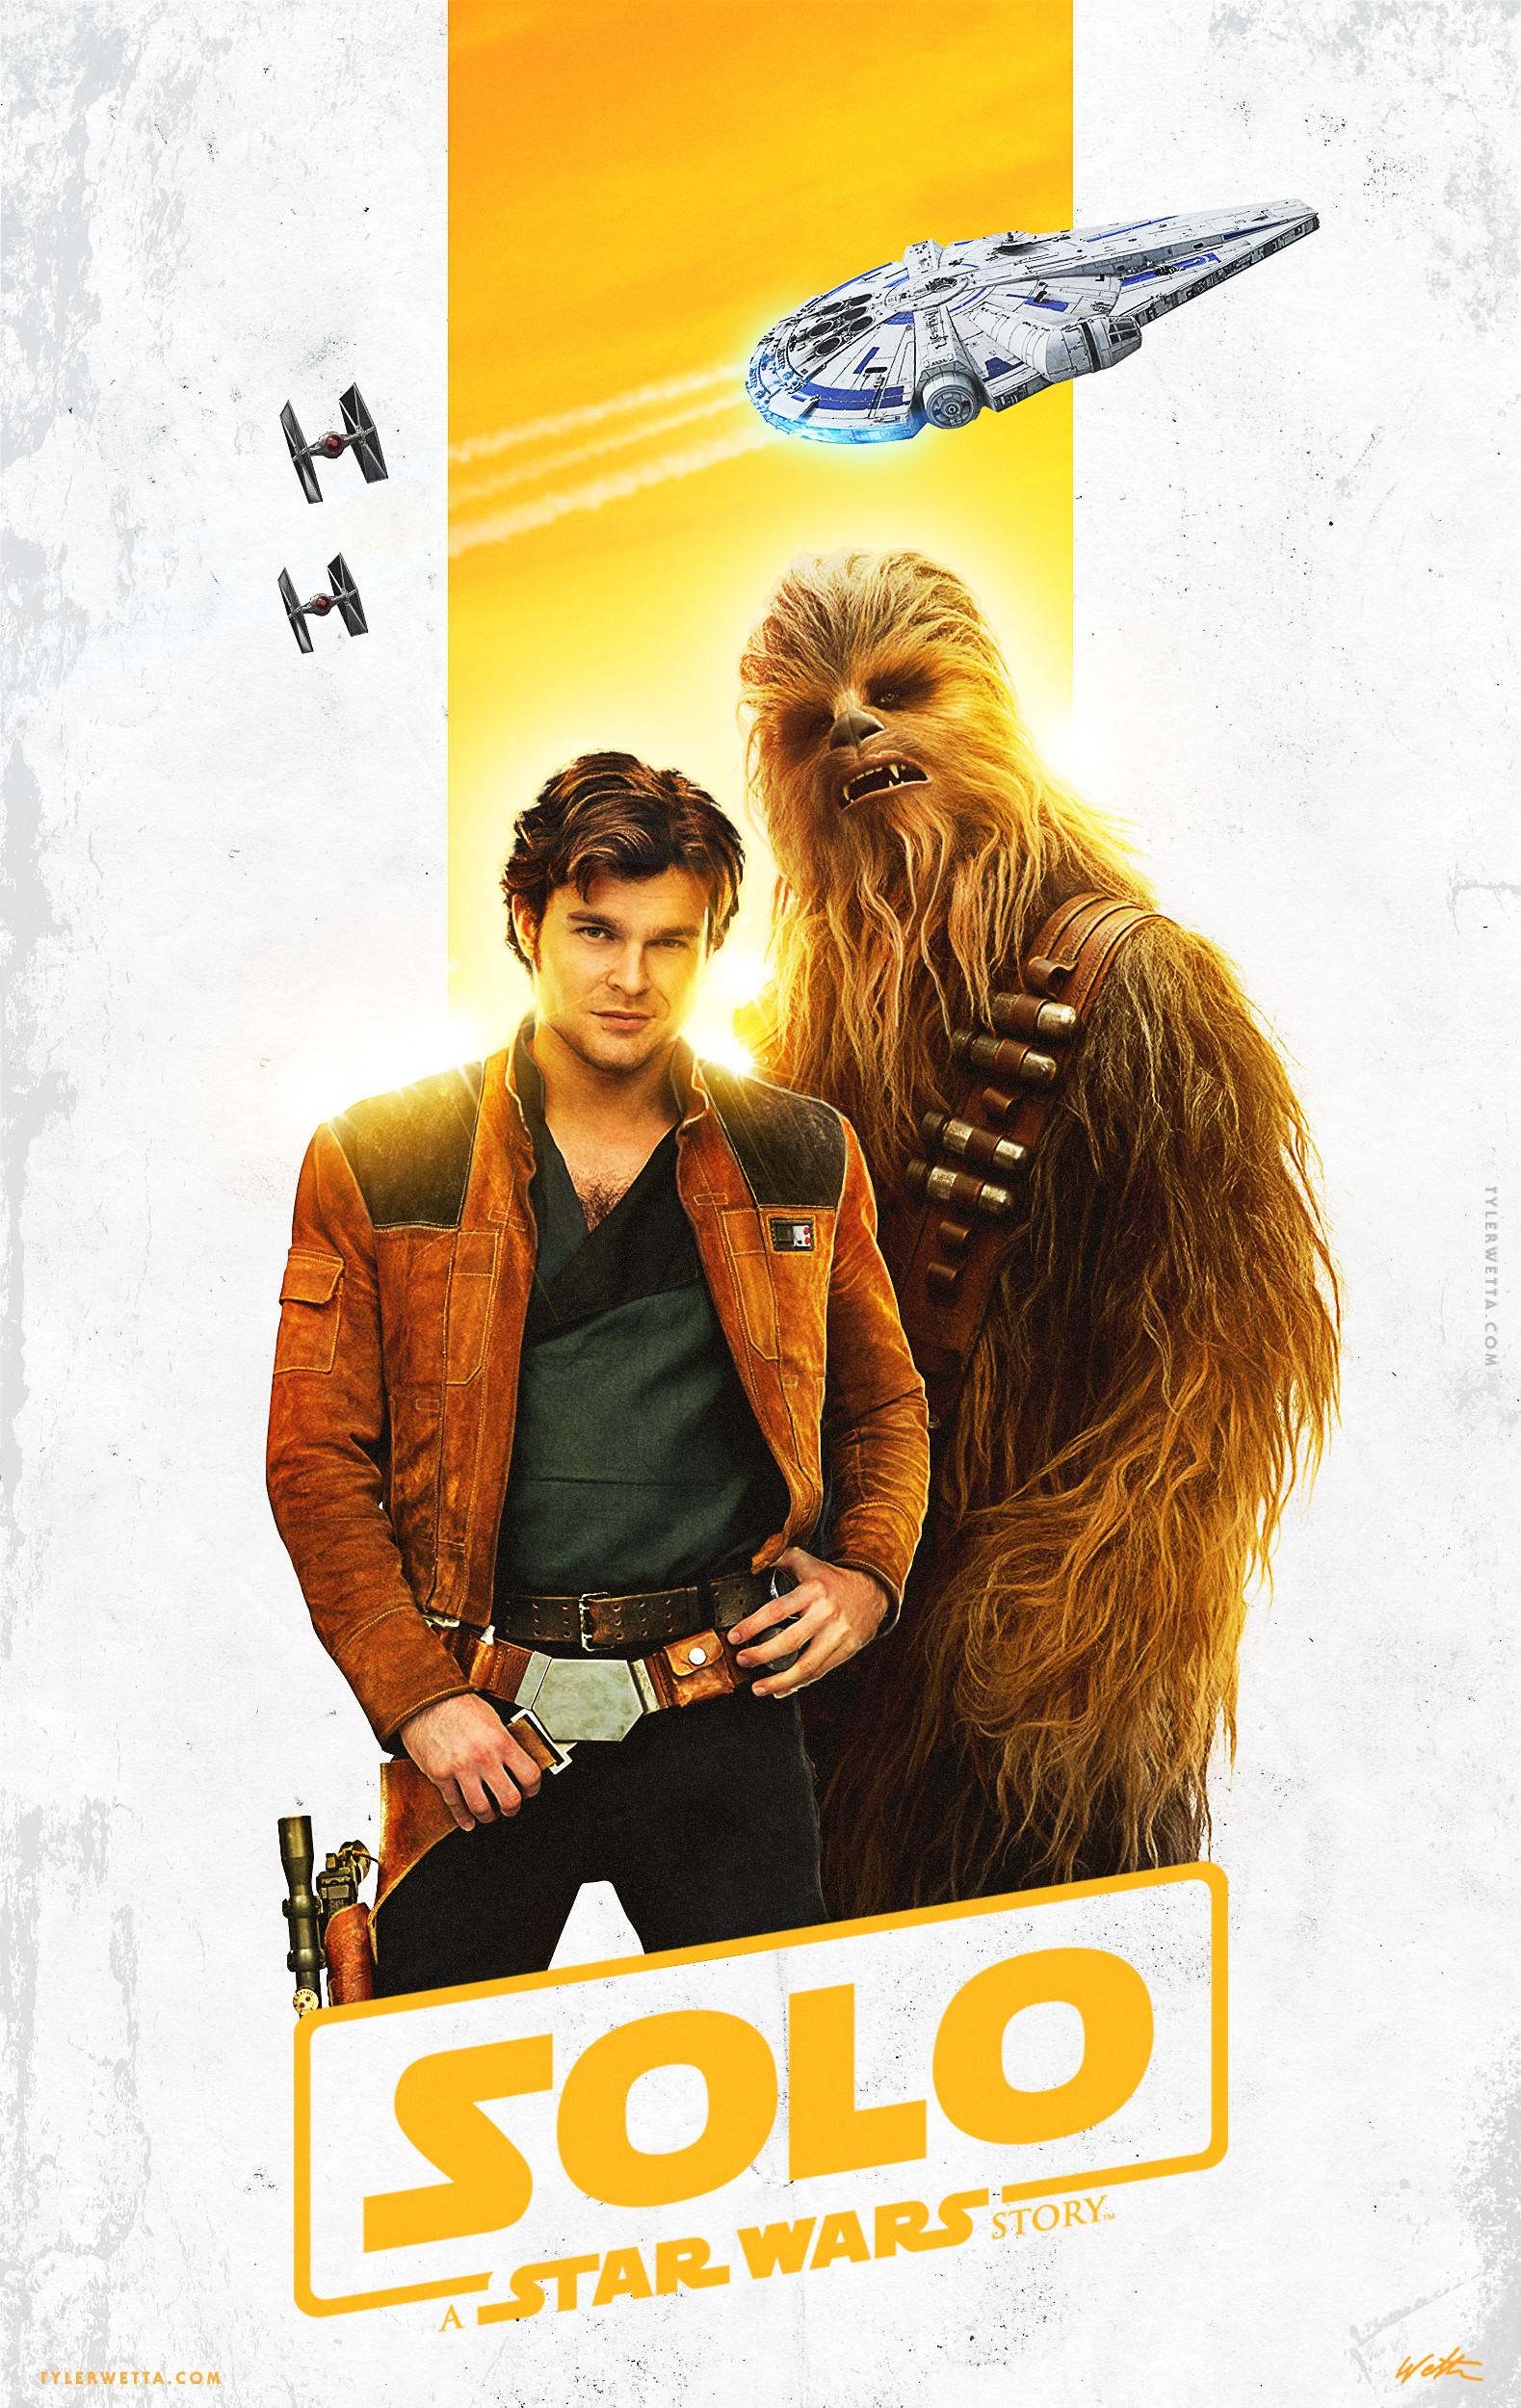 ArtStation - Solo: A Star Wars Story Movie Poster, Tyler Wetta